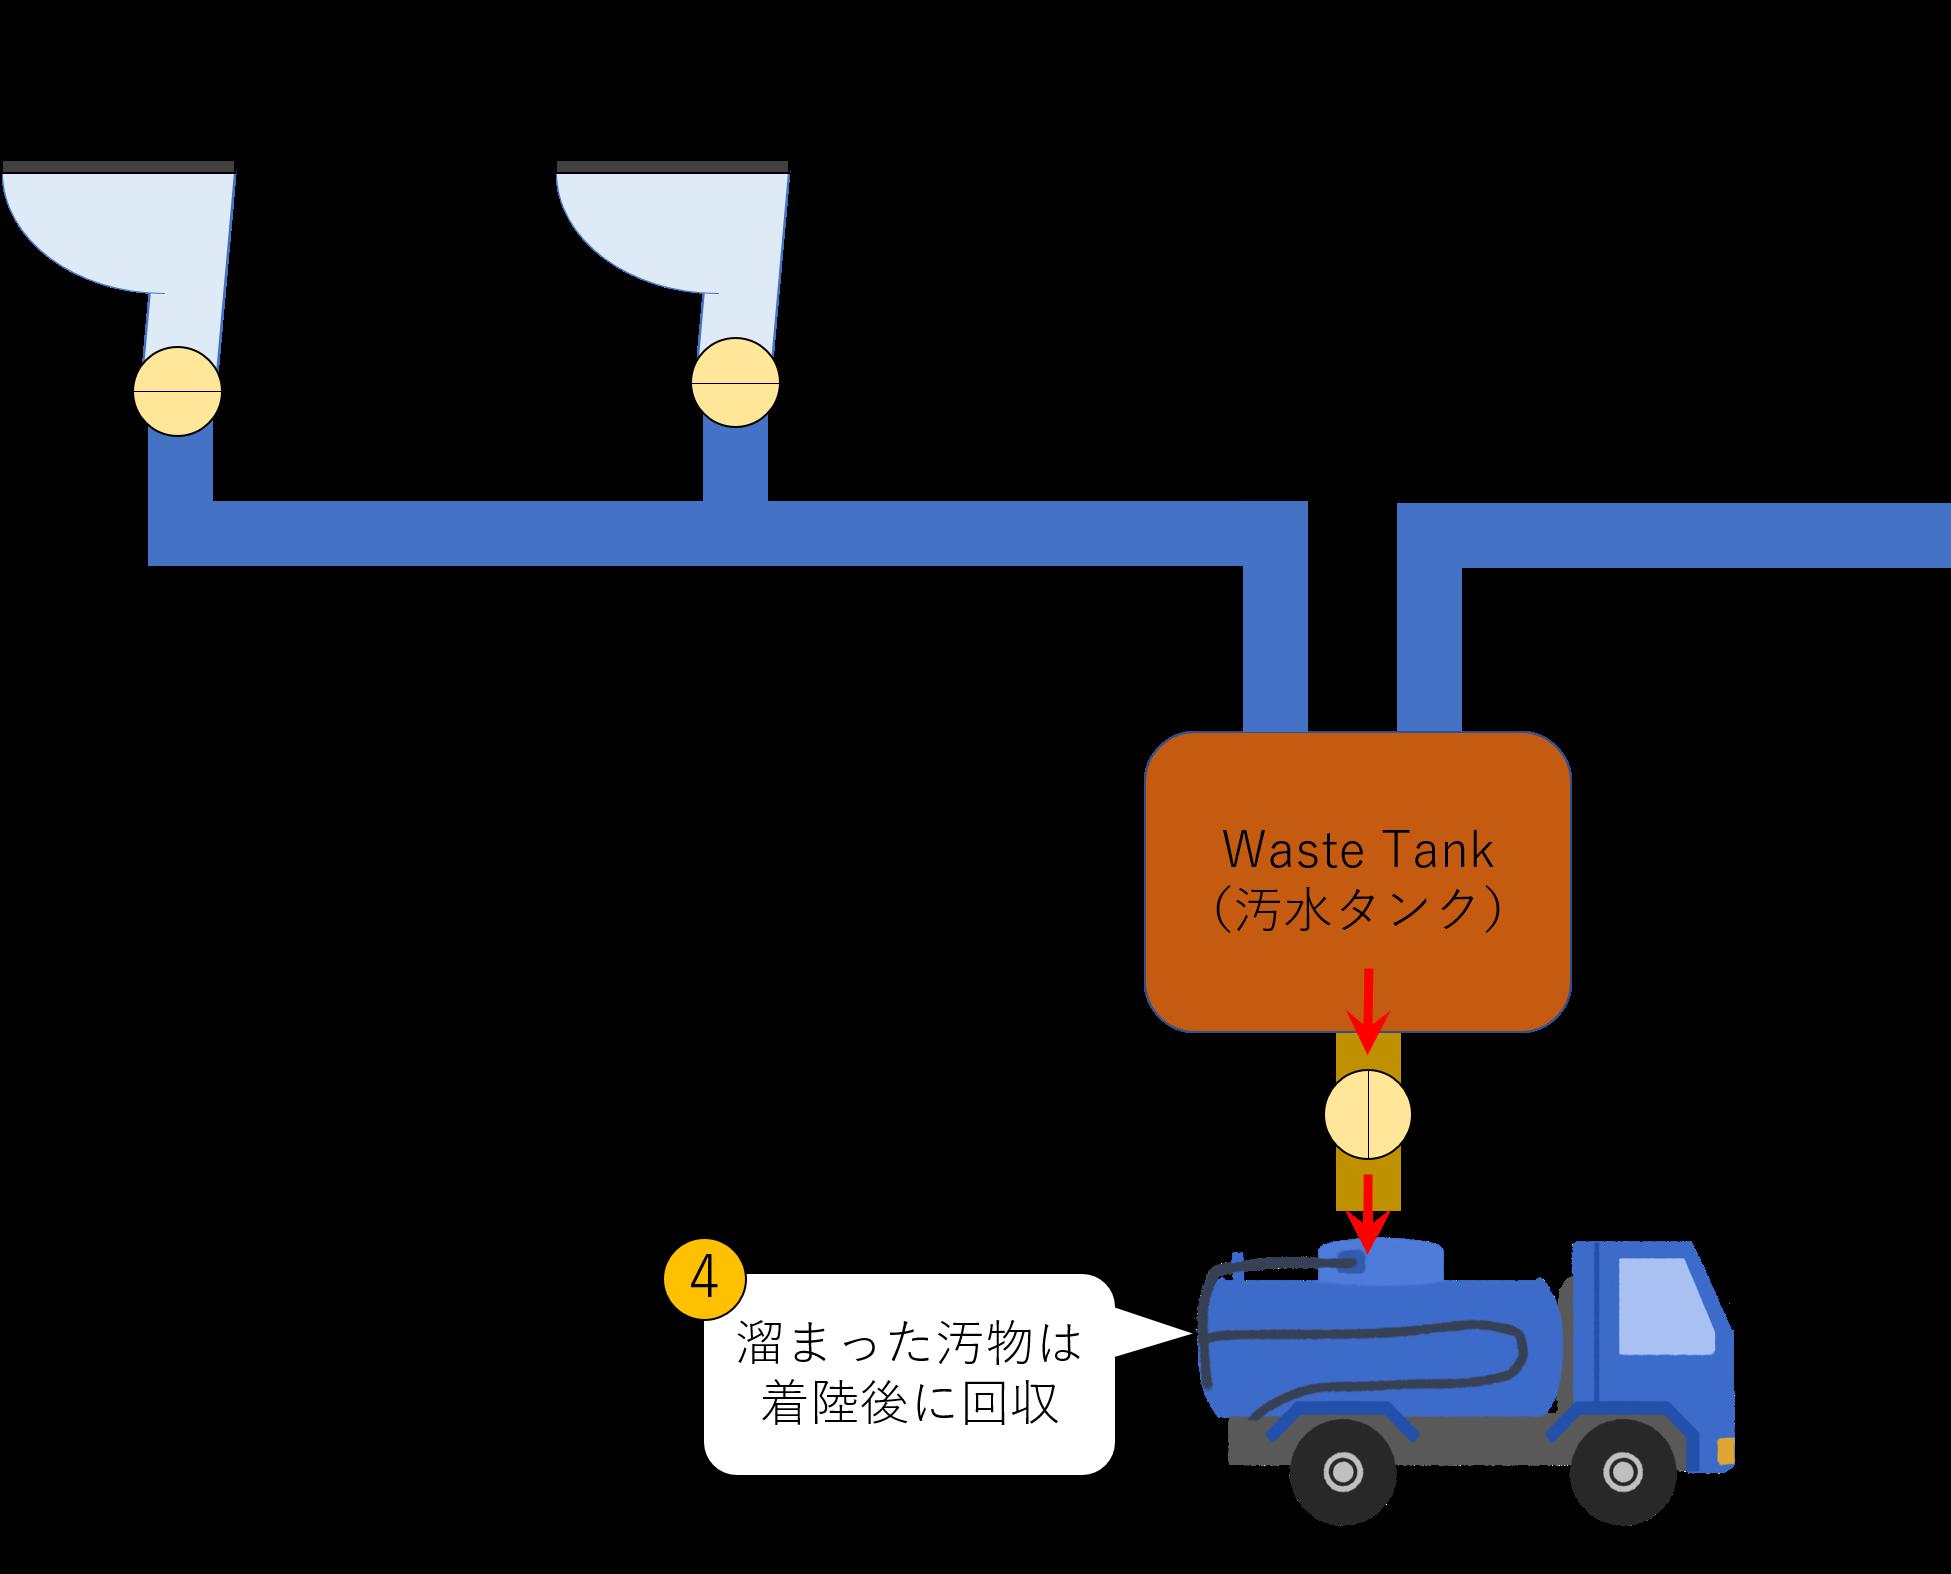 Waste Tankから汚物を回収するイメージ図